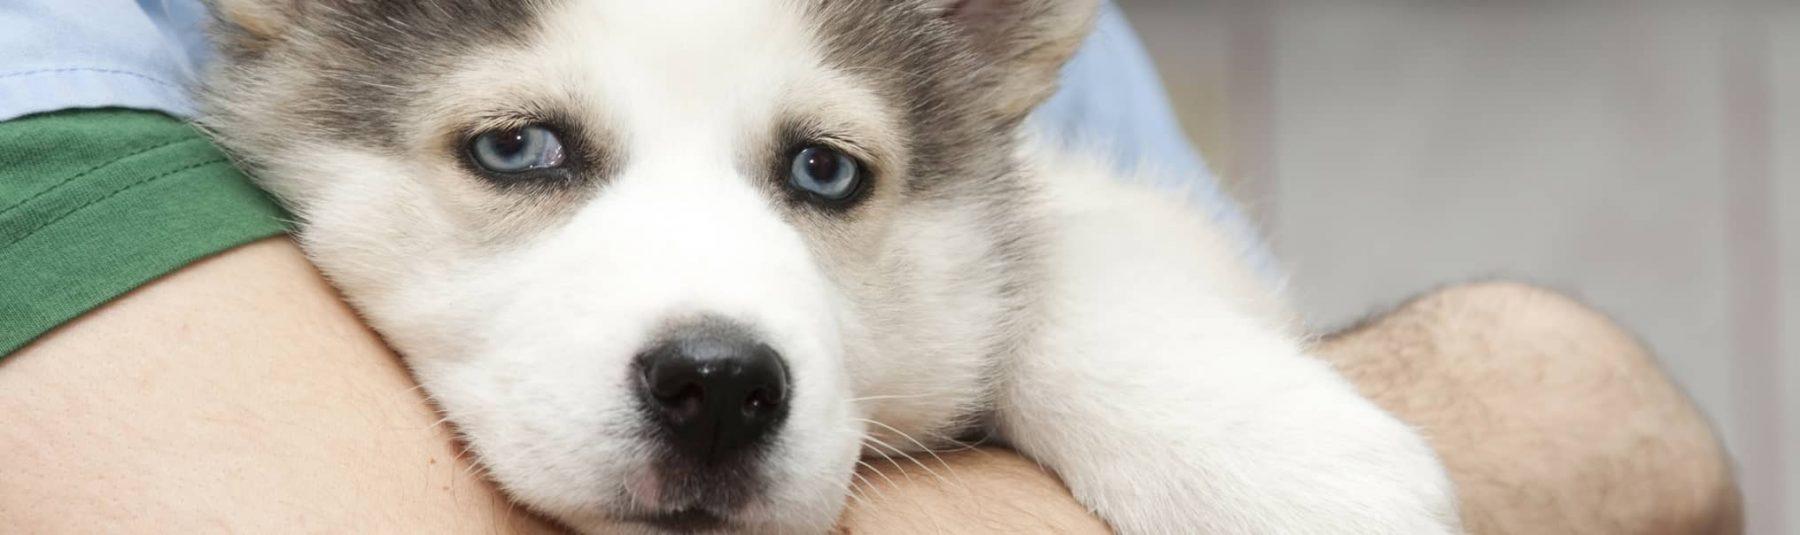 heartwormtest-service-dog